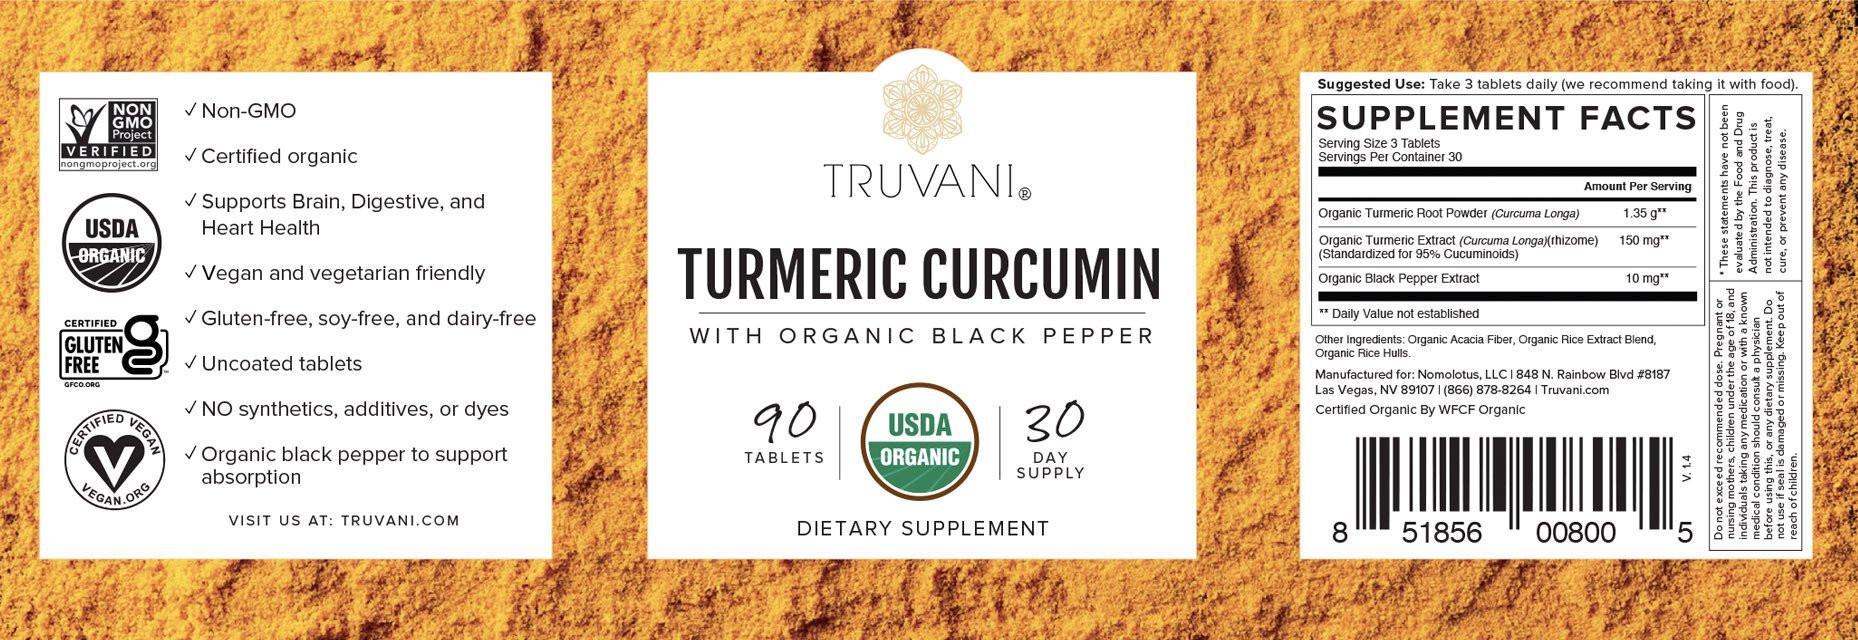 Truvani-Turmeric-Curcumin-Nutrition-Label.jpg